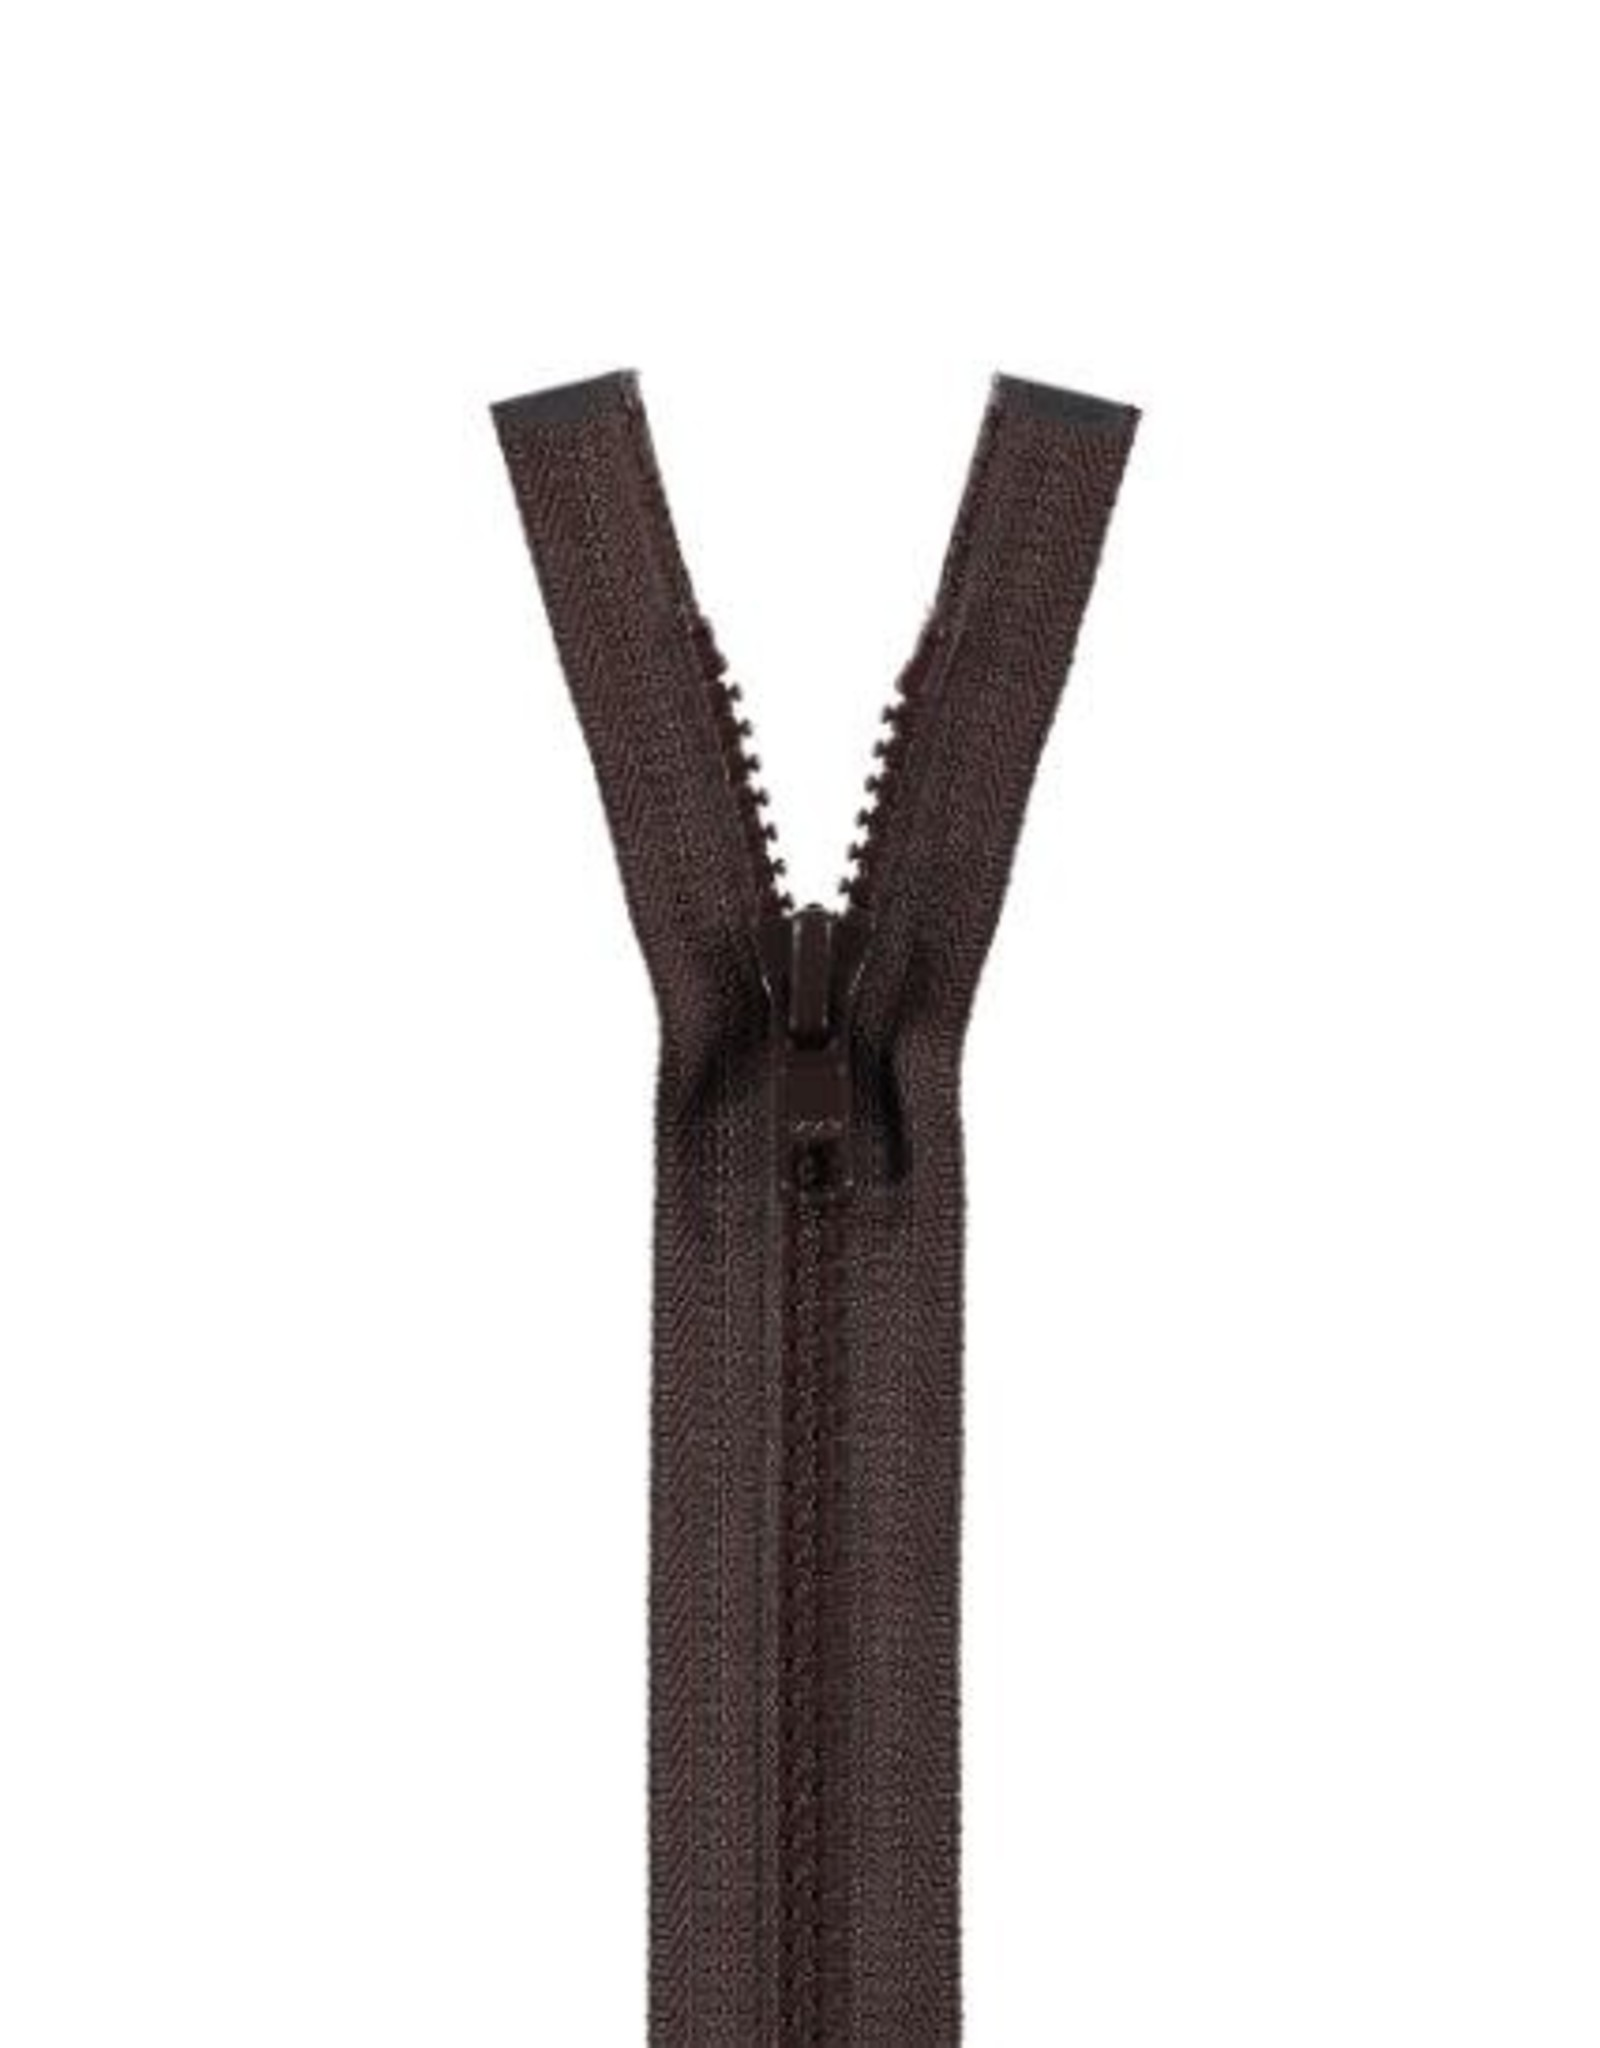 YKK BLOKRITS 5 DEELBAAR bruin 570-35cm